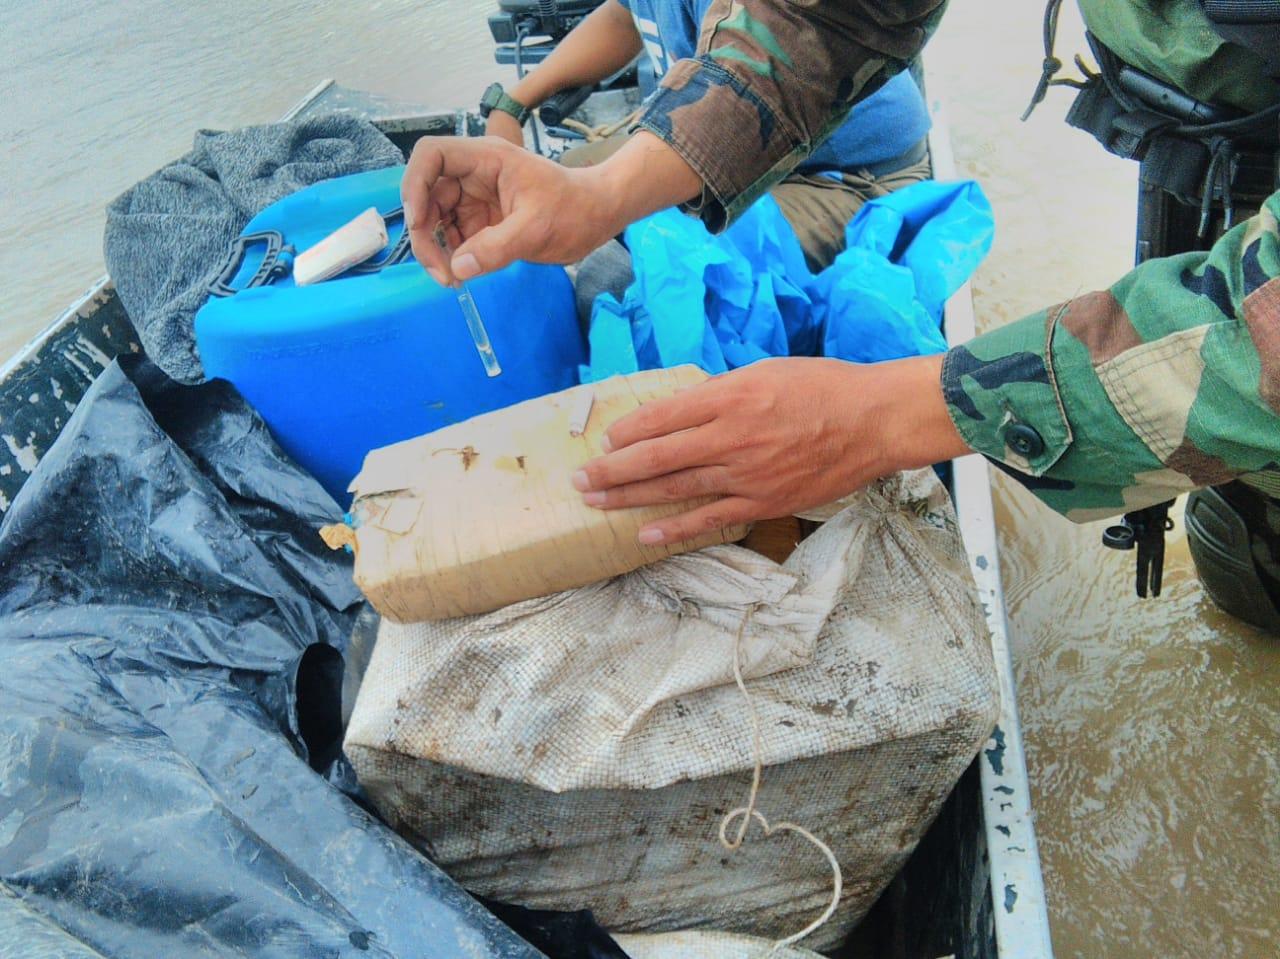 Peruvian Navy Seizes More Than 1 Ton of Marijuana